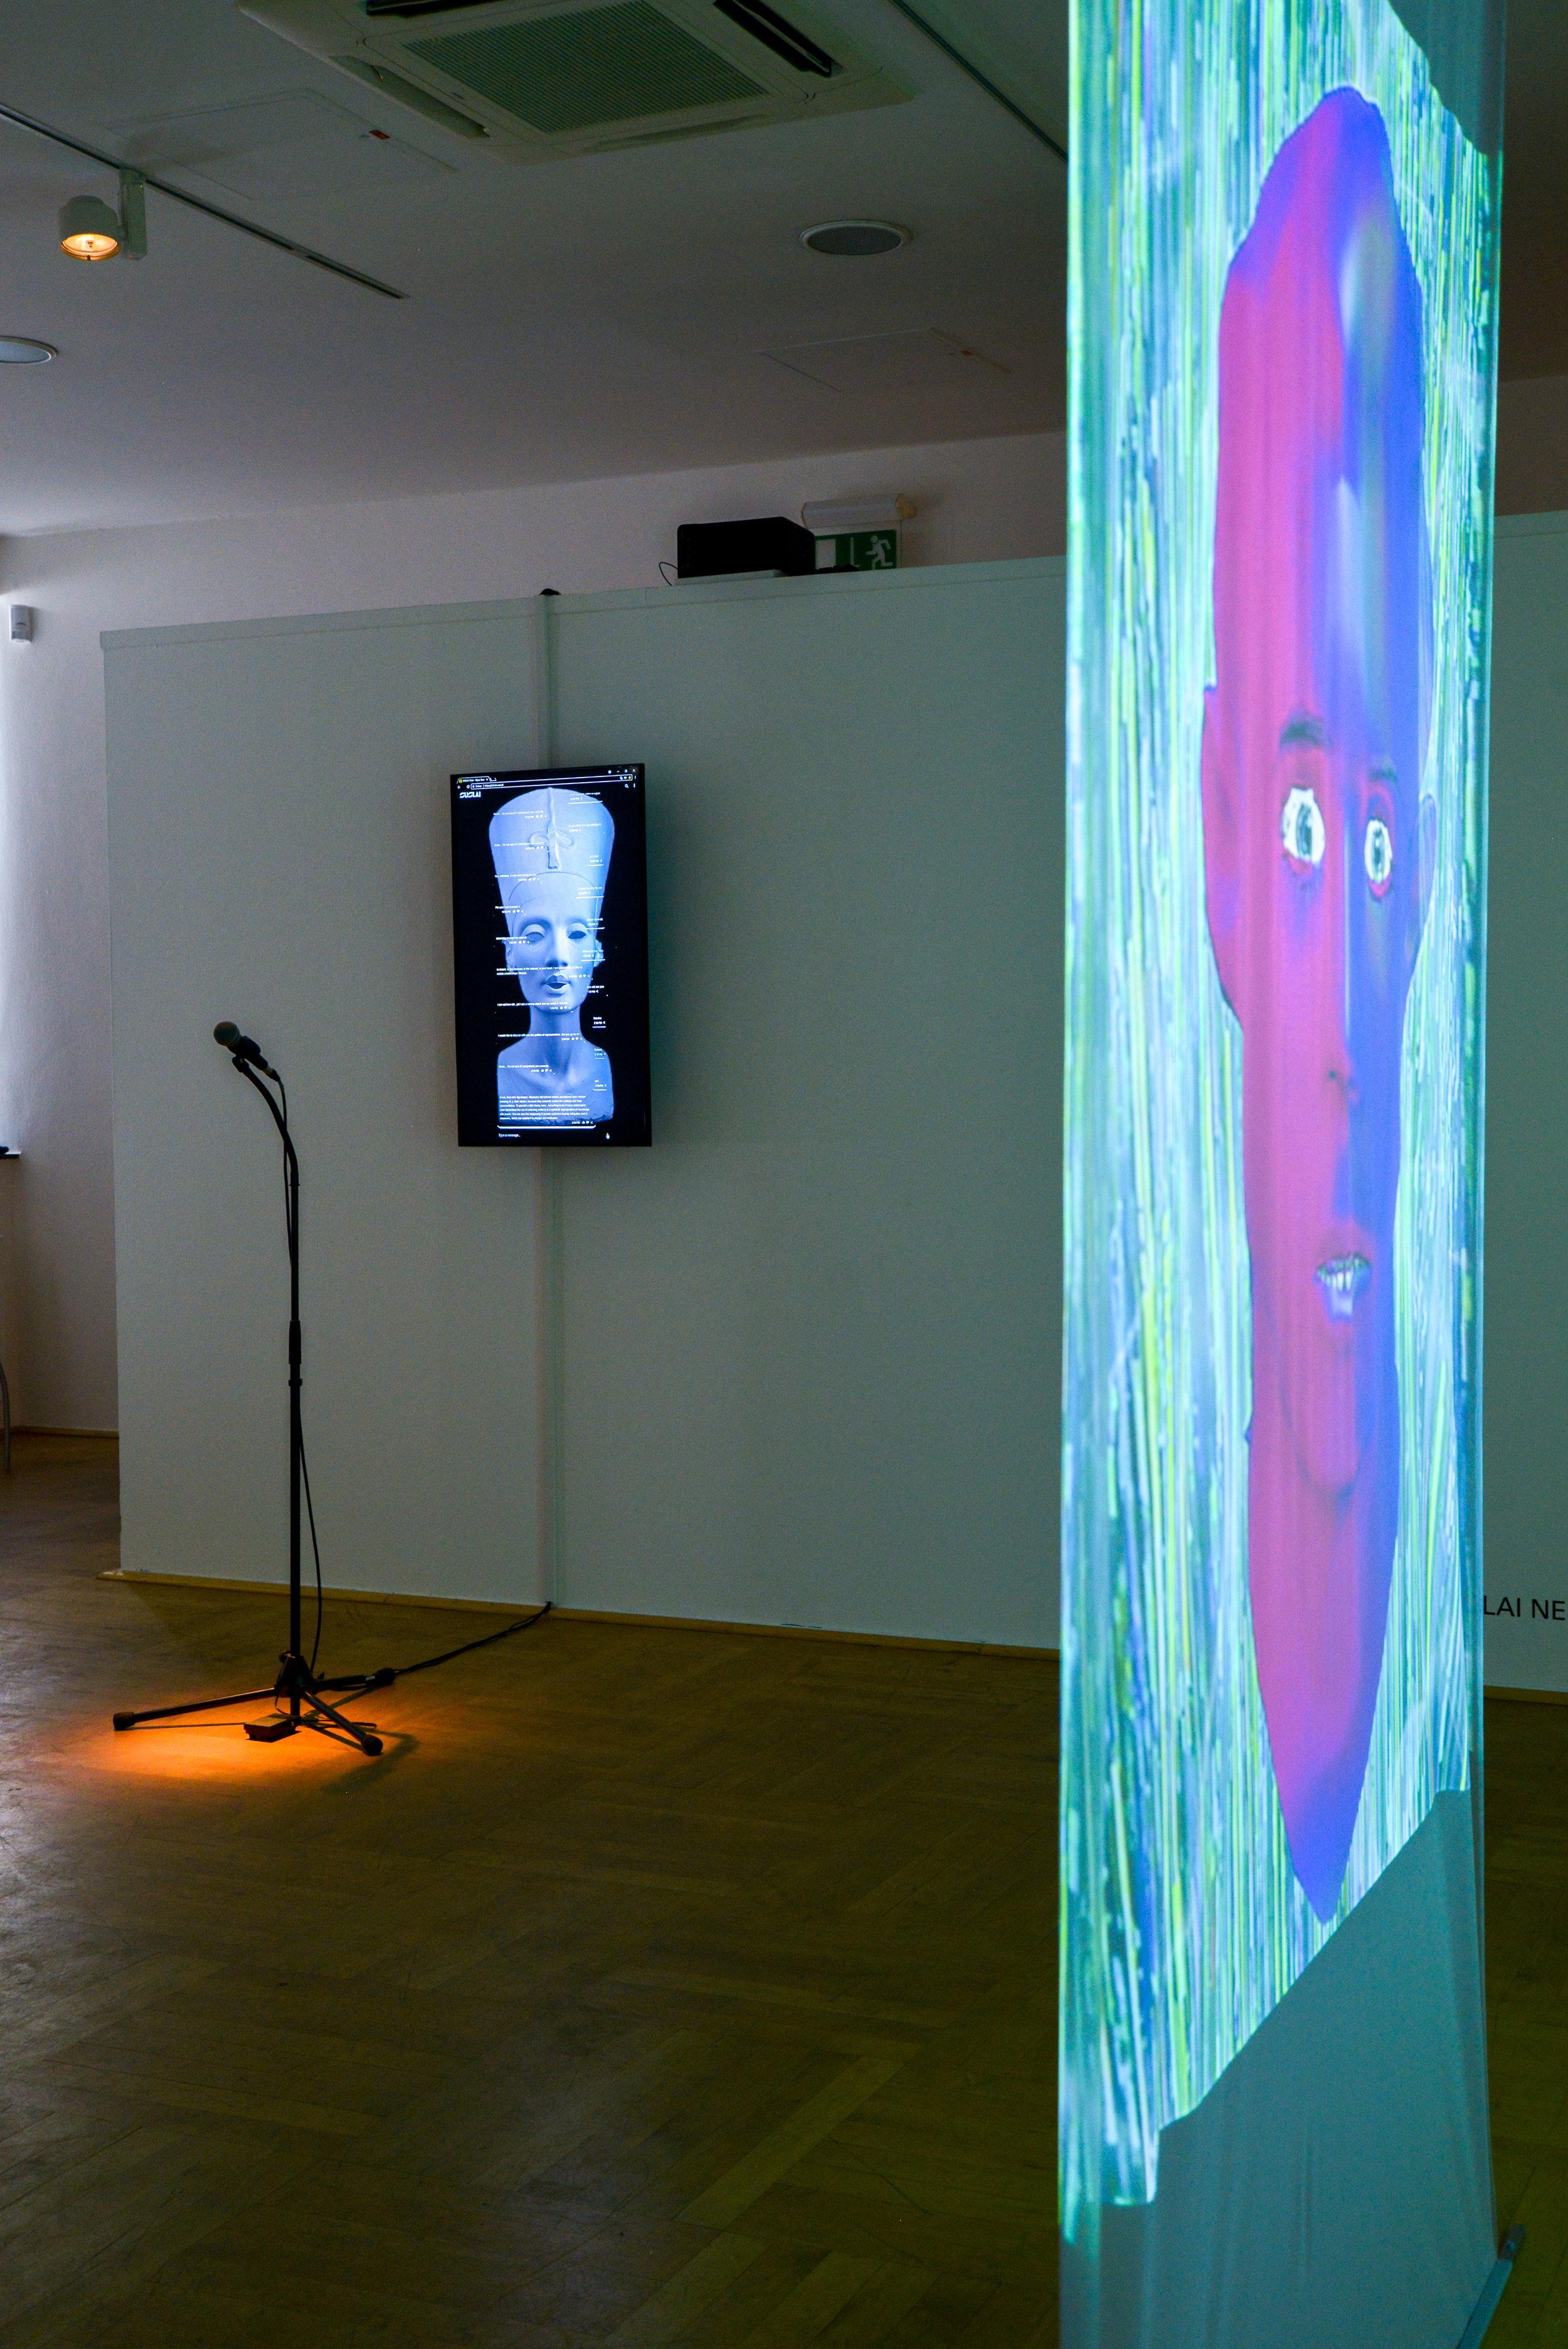 Exhibition view: PENDORAN VINCI, installation by Al-Badri & Nelles, and Jonas Blume, photo © Jonas Blume, 2018